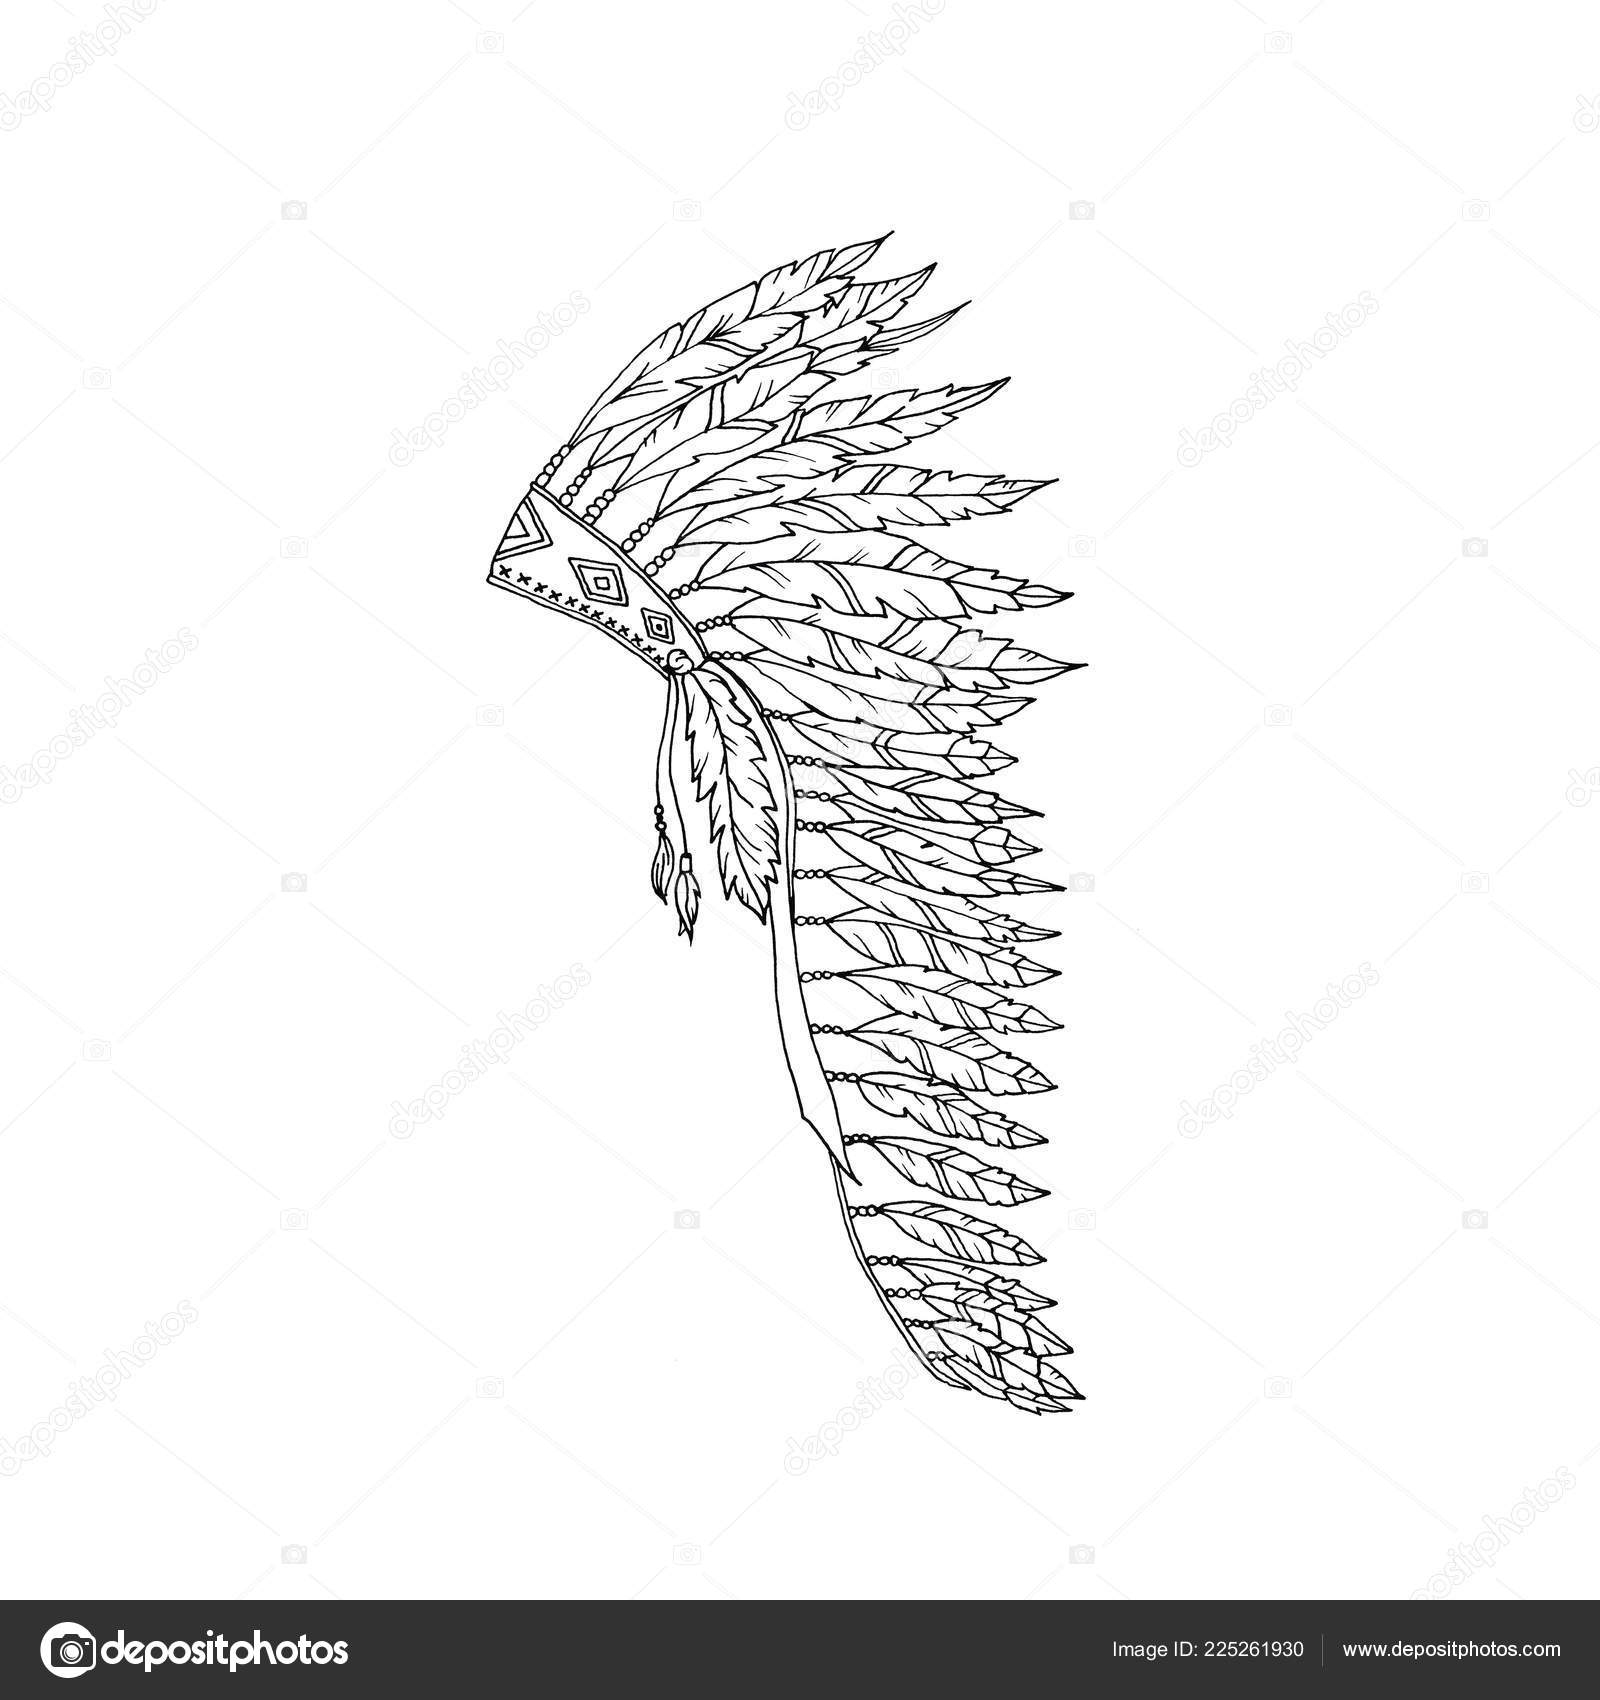 Dibujo Esquema Warbonnet Americano Sombrero Pluma águila Para